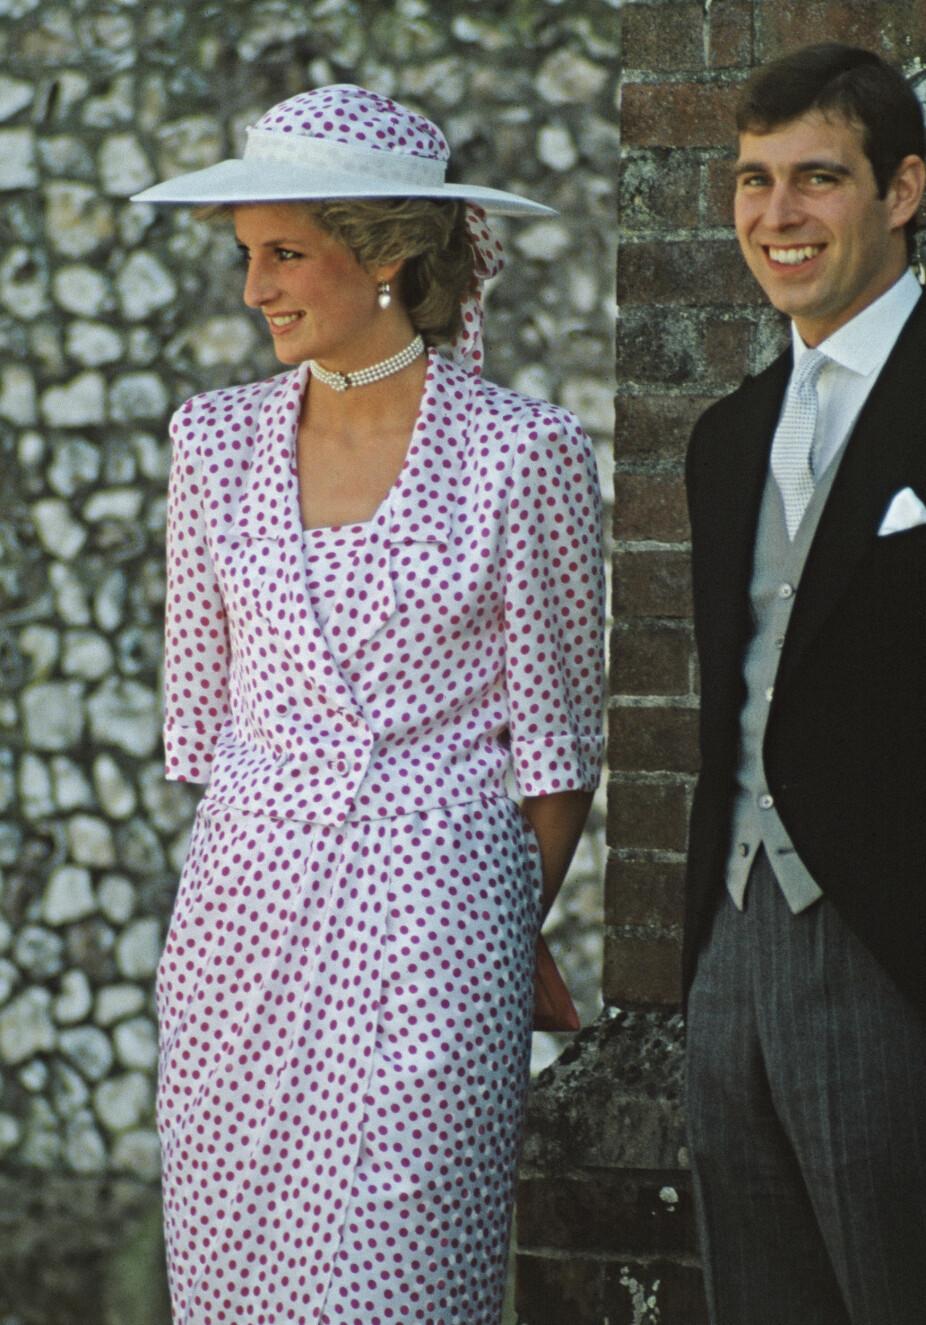 Bryllup i Hampshire i 1985